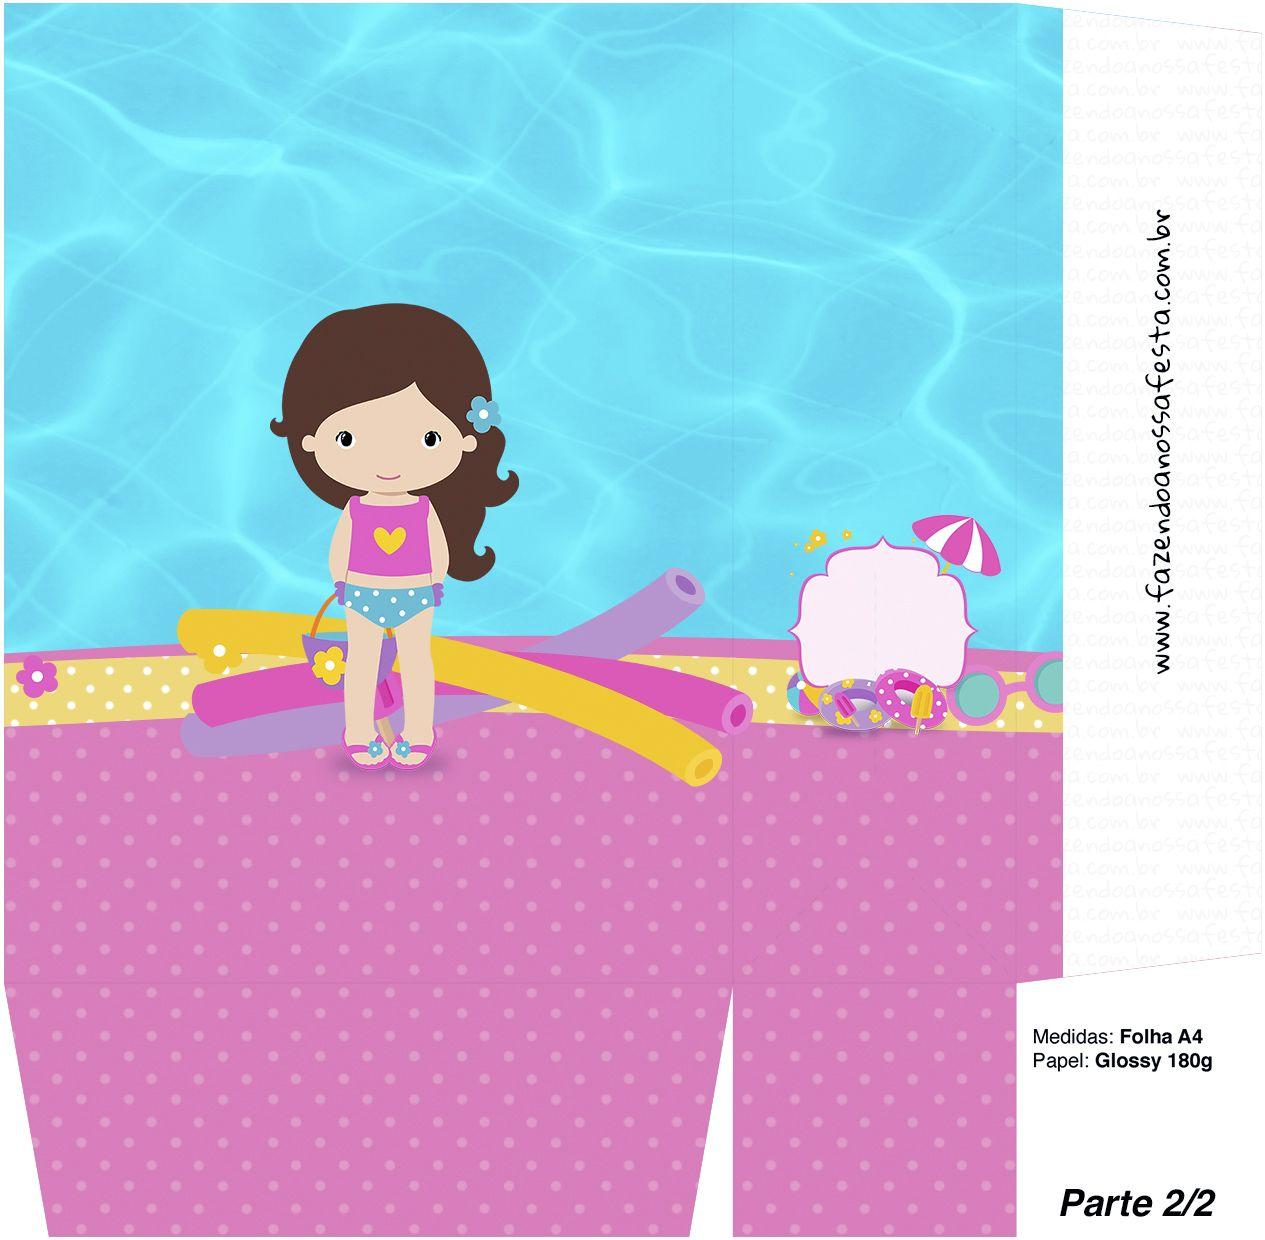 Sacolinha Surpresa Pool Party Menina Parte 2 Pinterest Molde